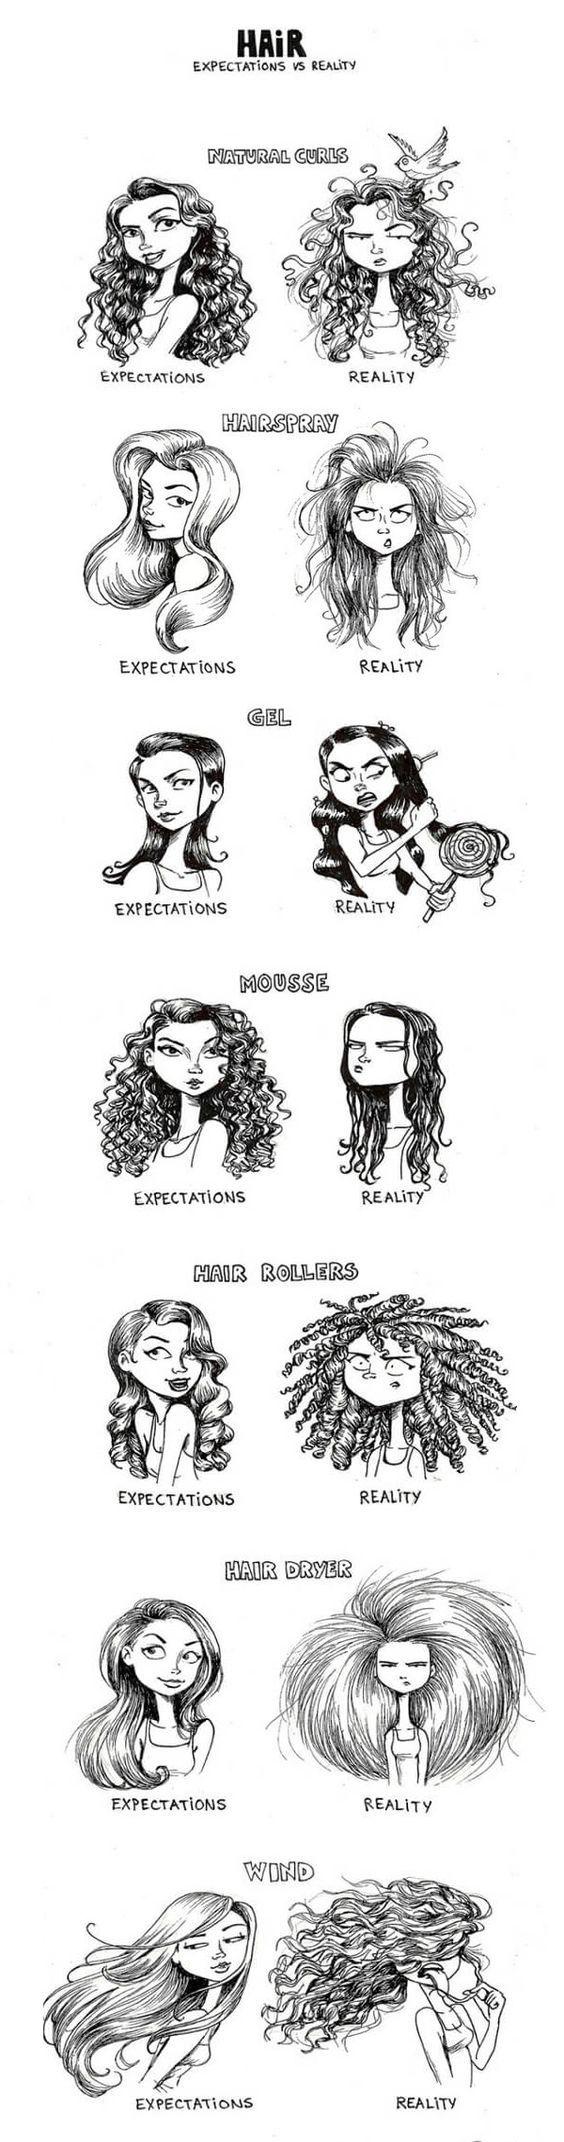 Womens Hair: Expectations Vs Reality - by C-Cassandra (http://c-cassandra.tumblr.com/about):